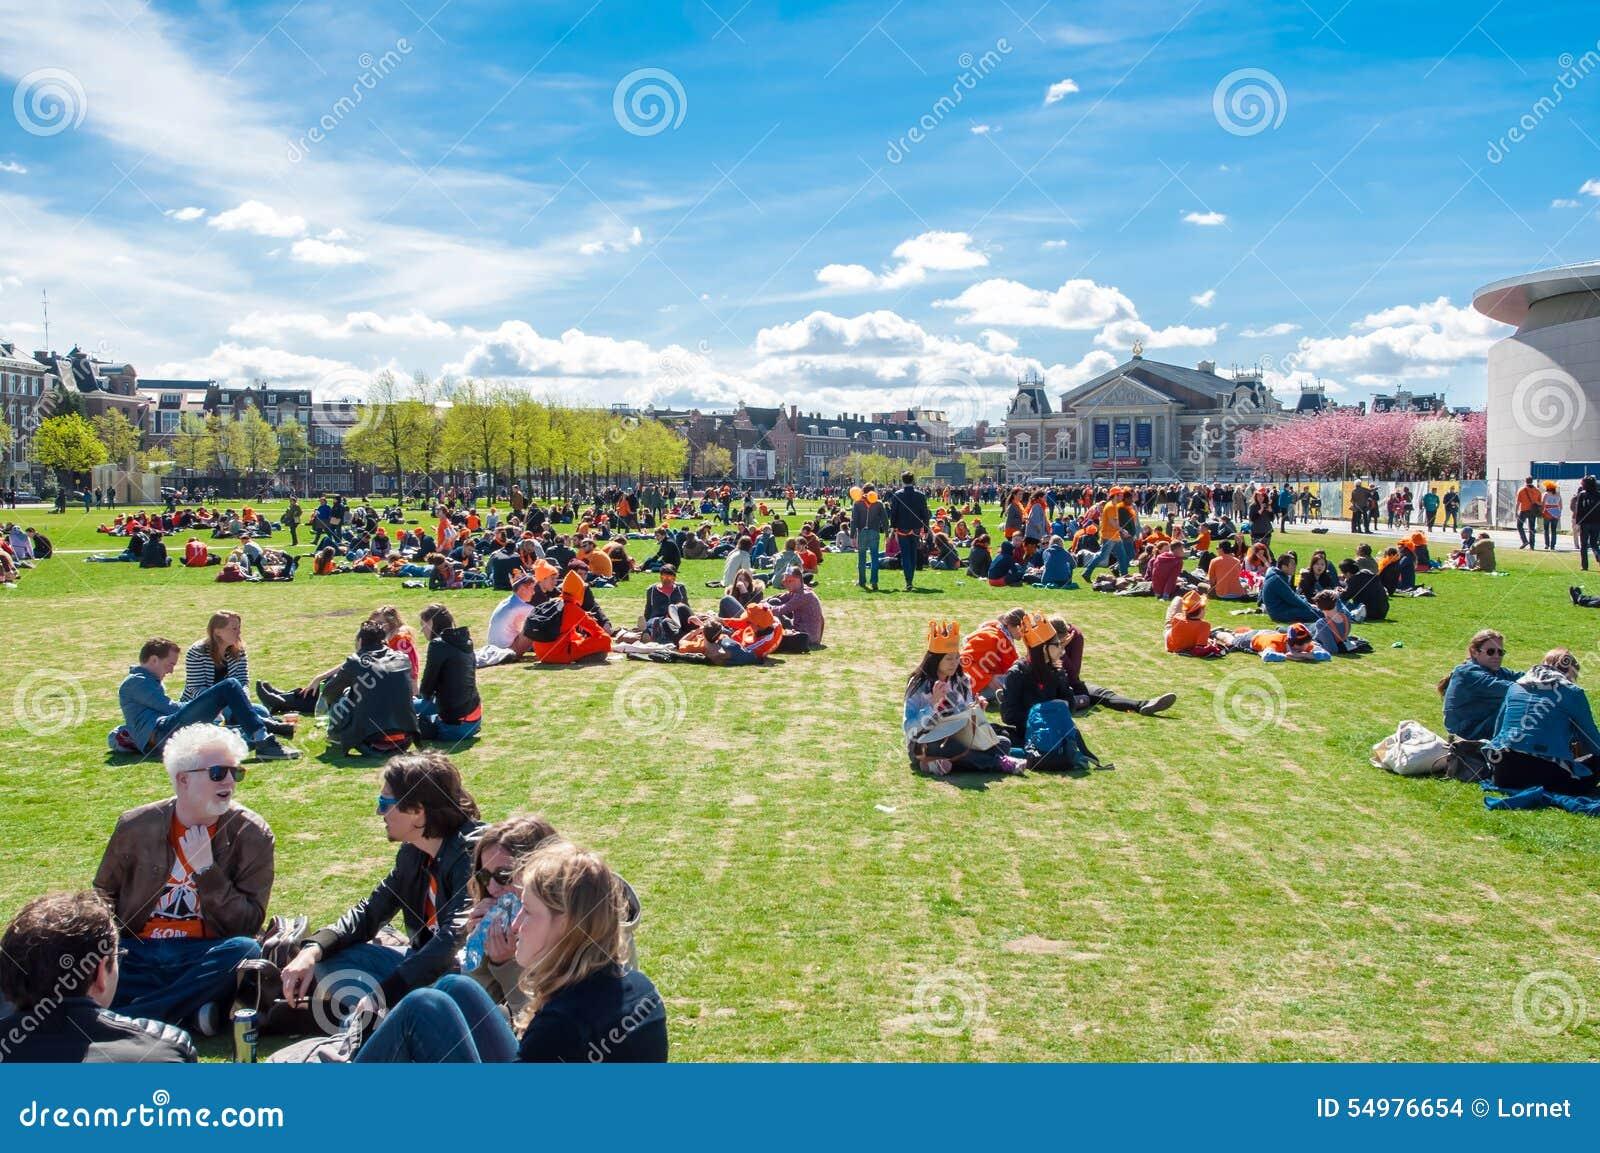 AMSTERDAM-APRIL 27: Folket kopplar av på Museumpleinen på konungens dag på April 27,2015